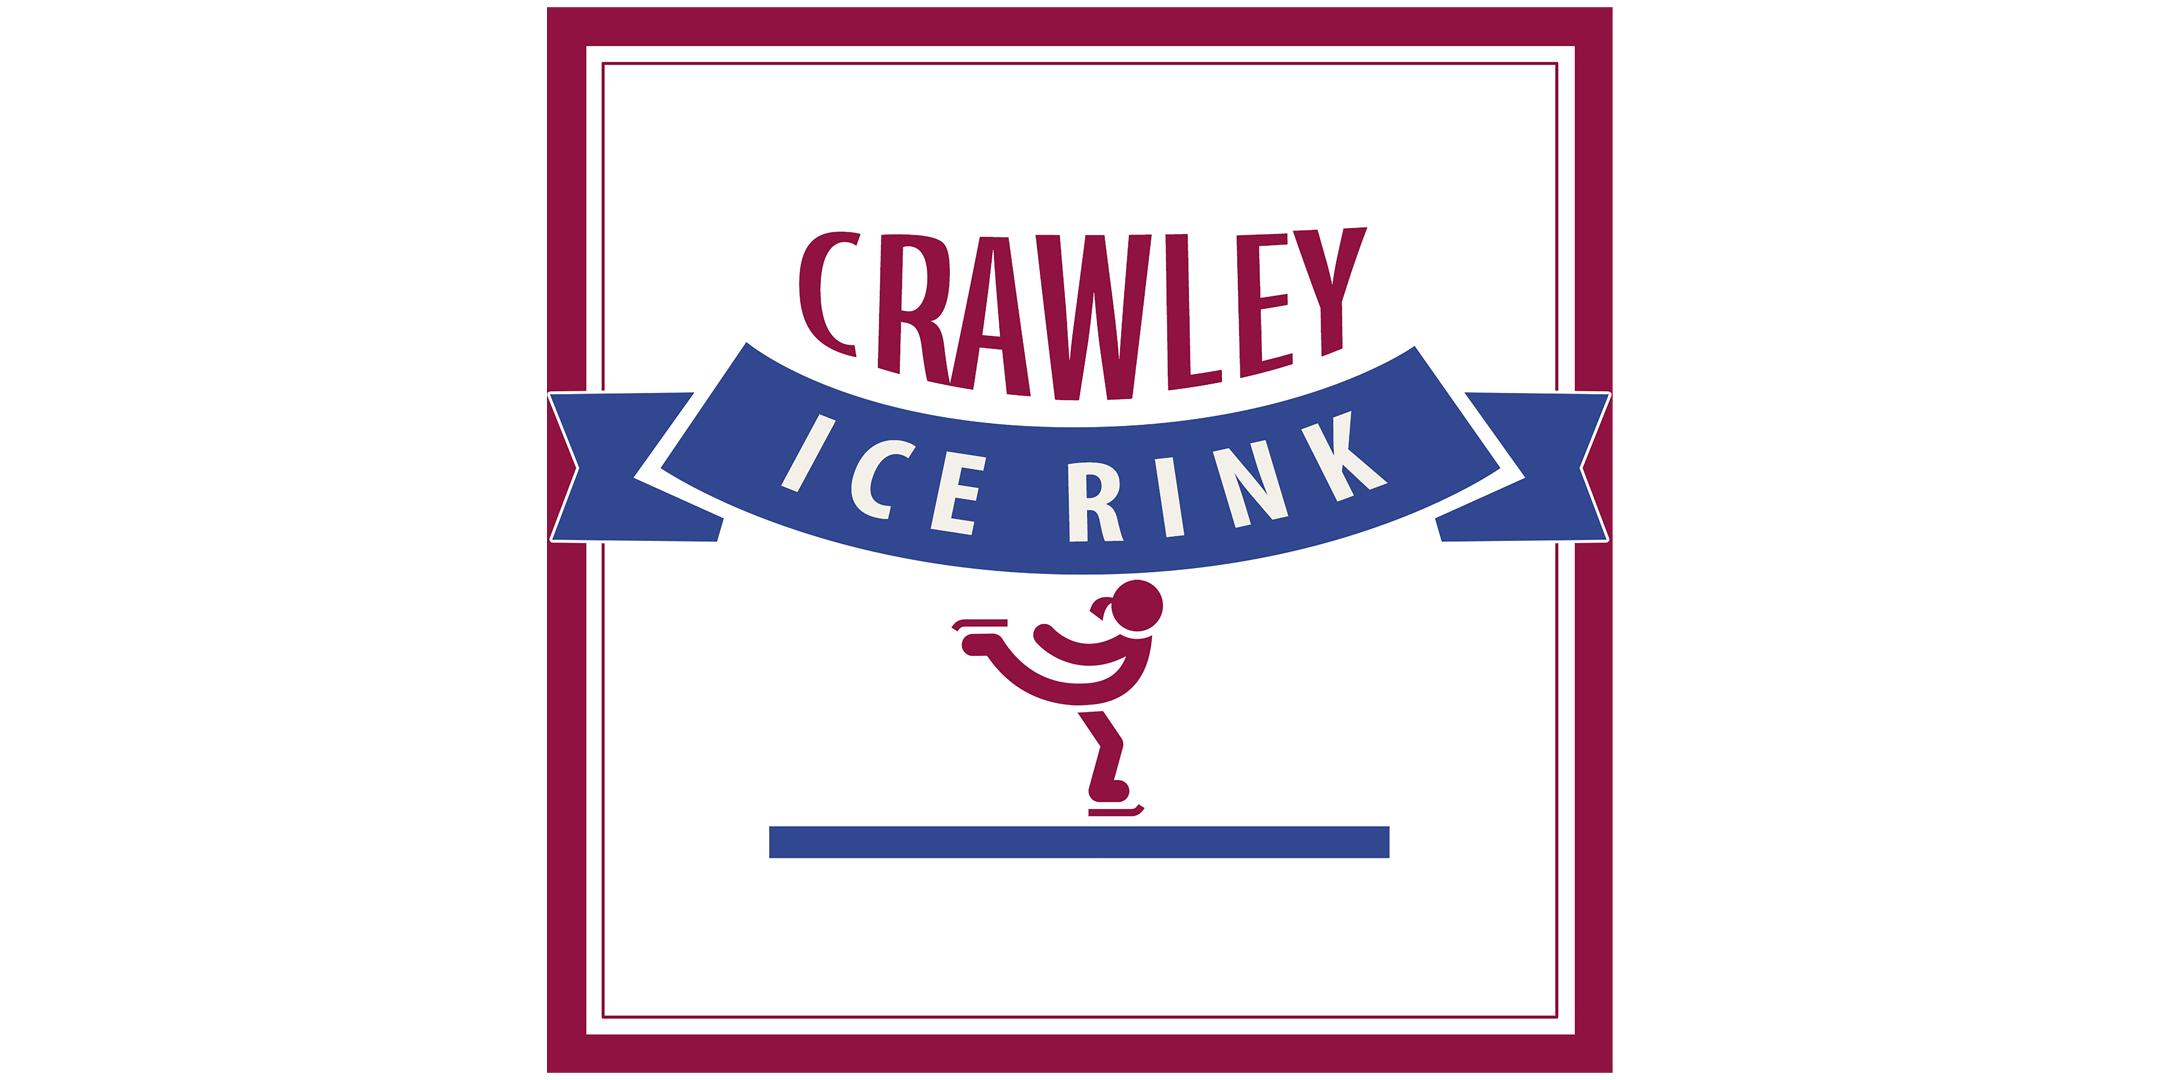 Crawley Ice Rink - 23rd November (Off Peak)